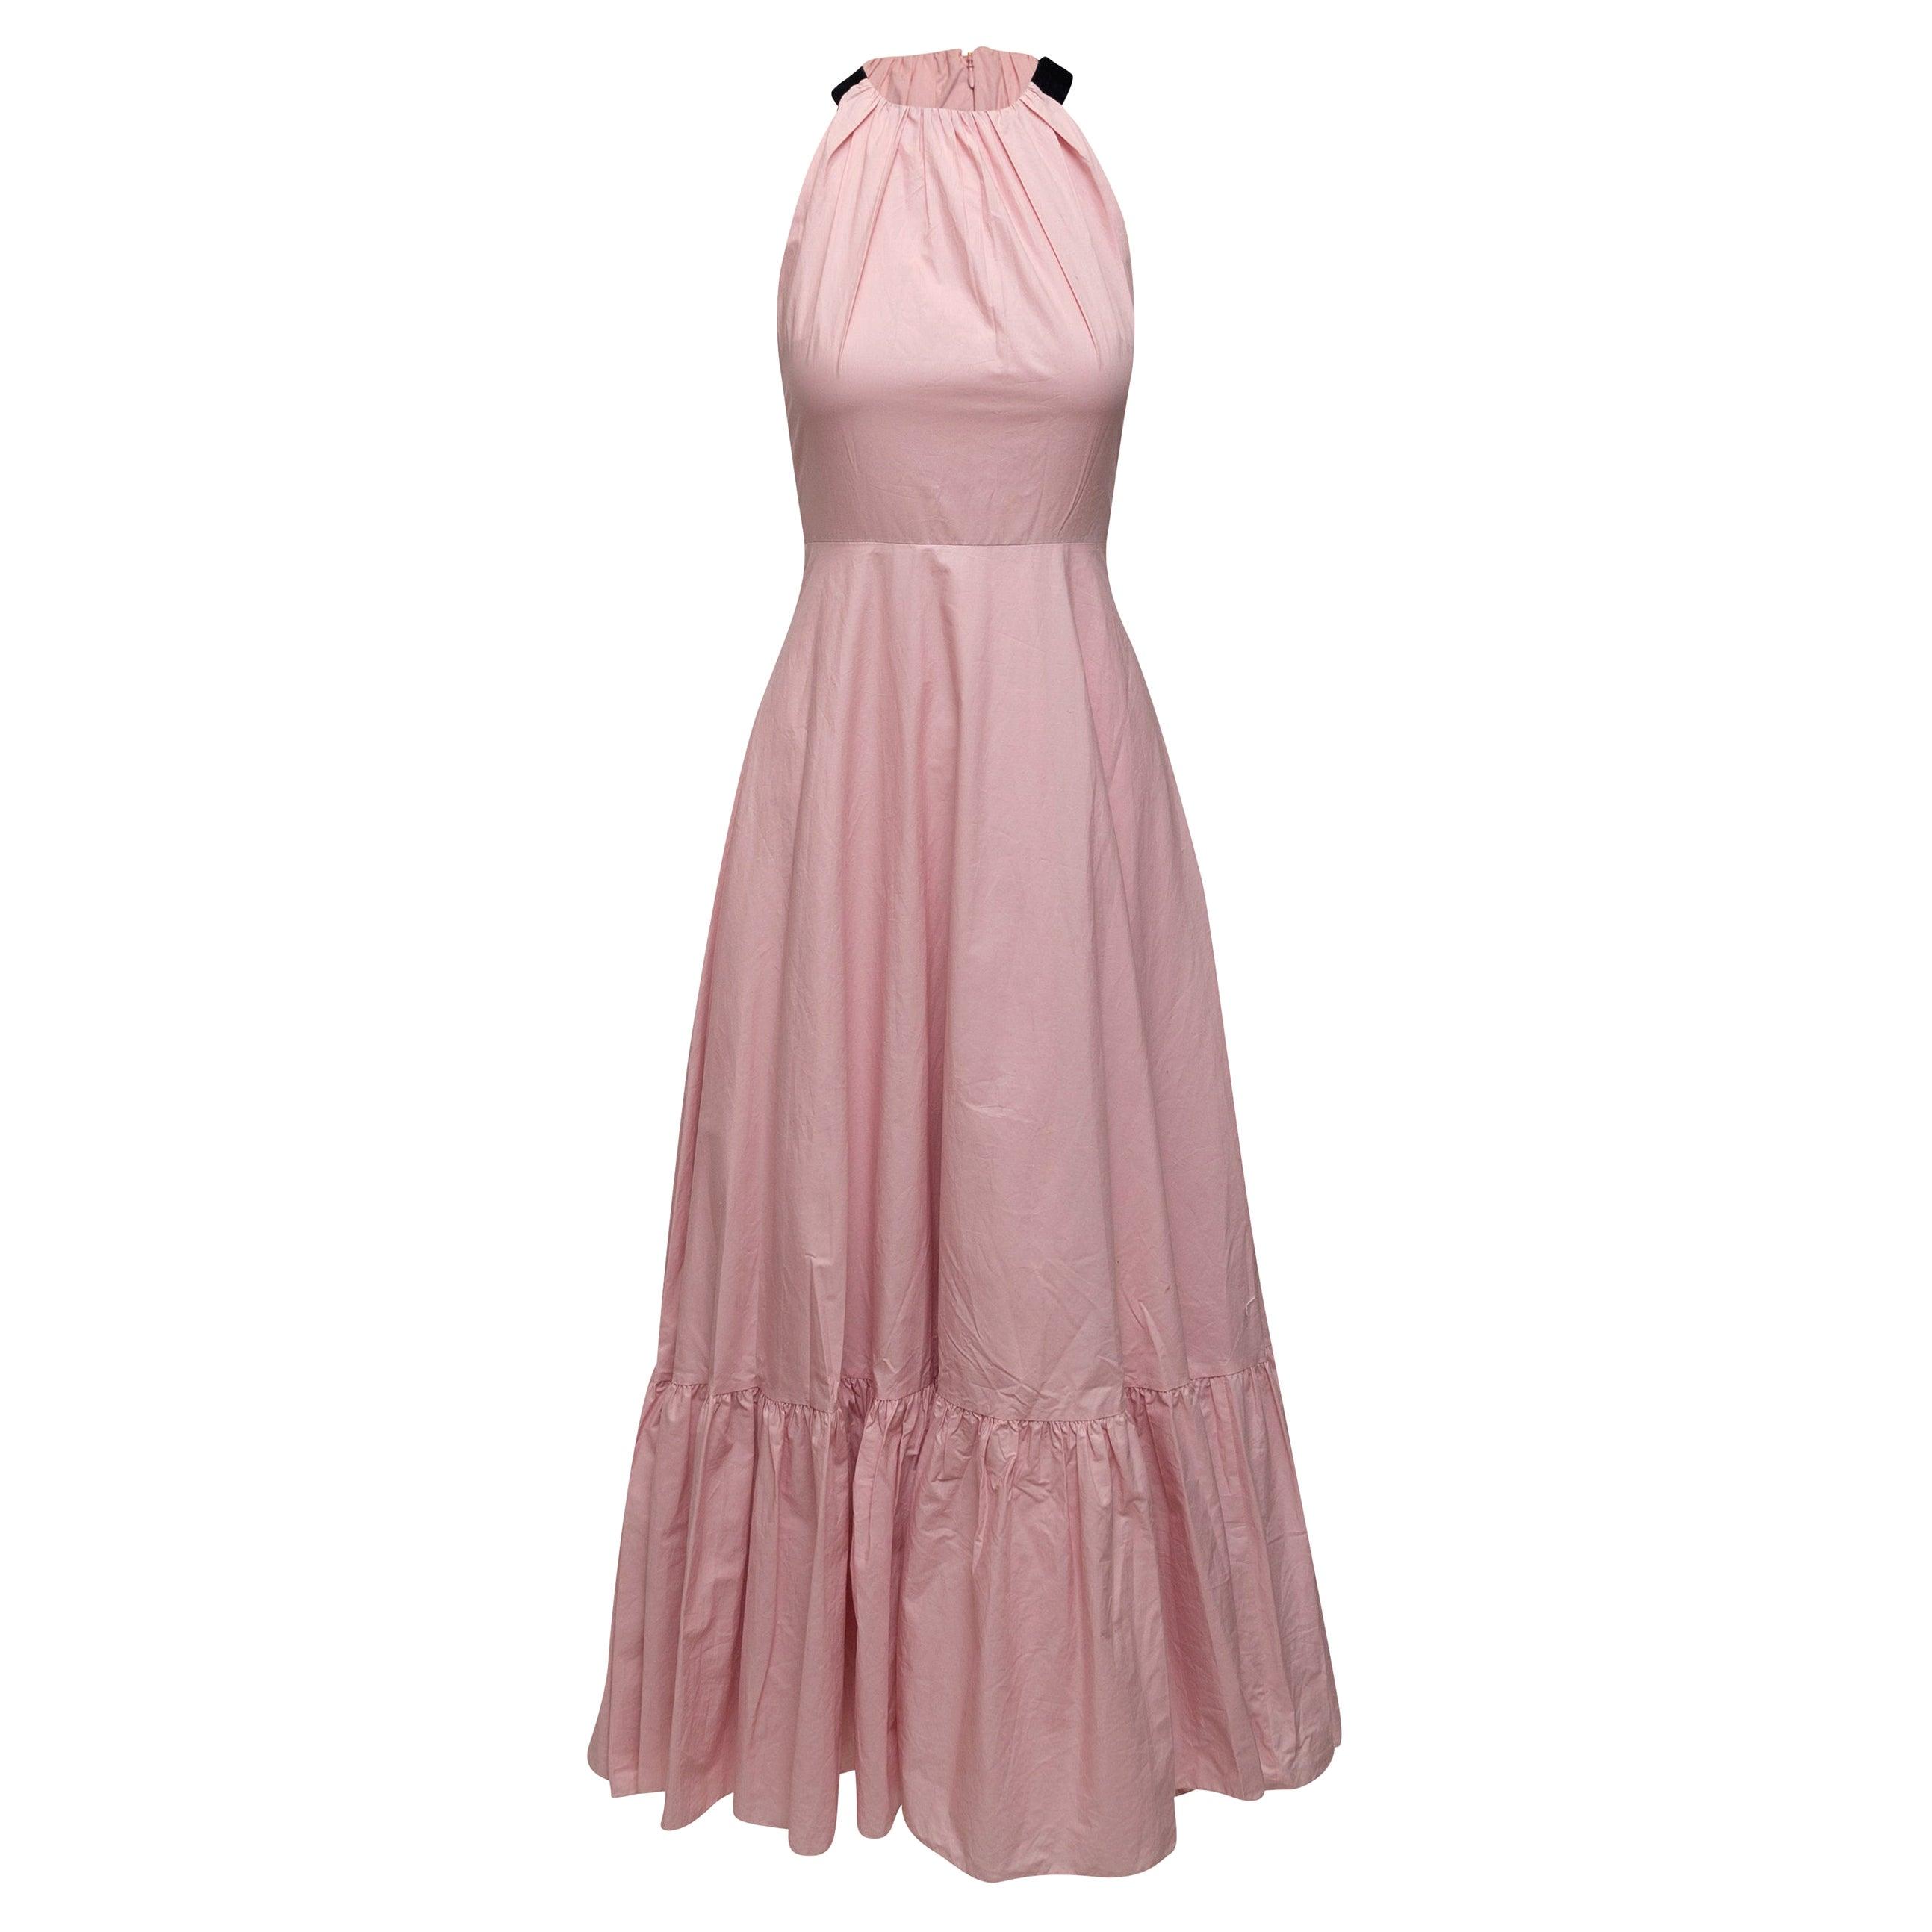 Roksanda Pink Sleeveless Maxi Dress